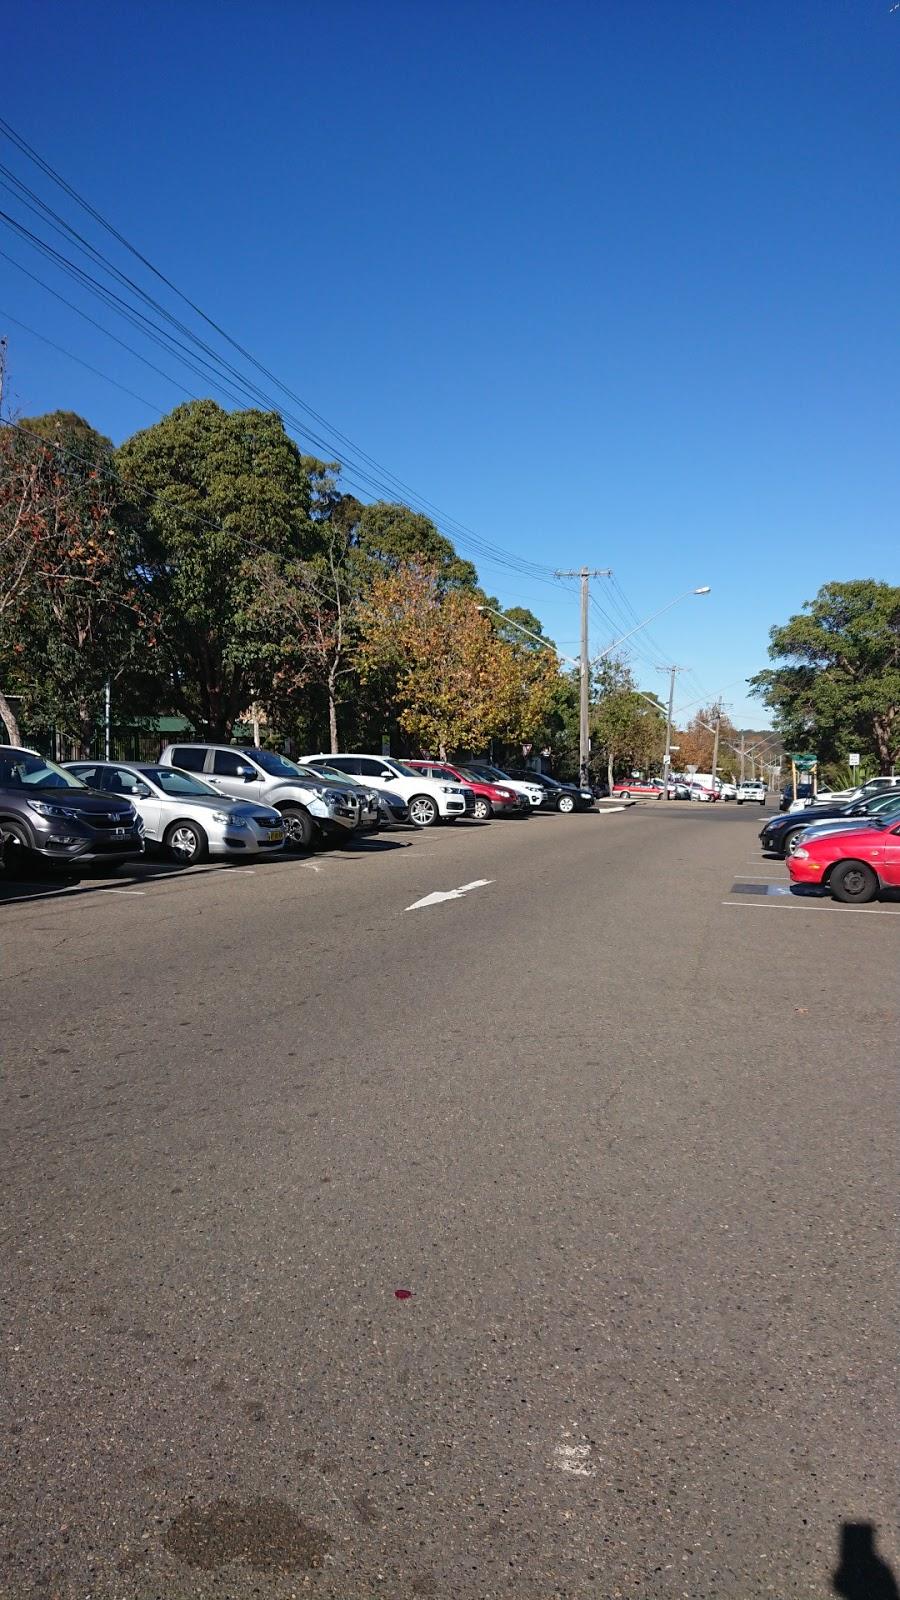 Repco Sutherland | car repair | 696 Old Princes Hwy, Sutherland NSW 2232, Australia | 0295217333 OR +61 2 9521 7333